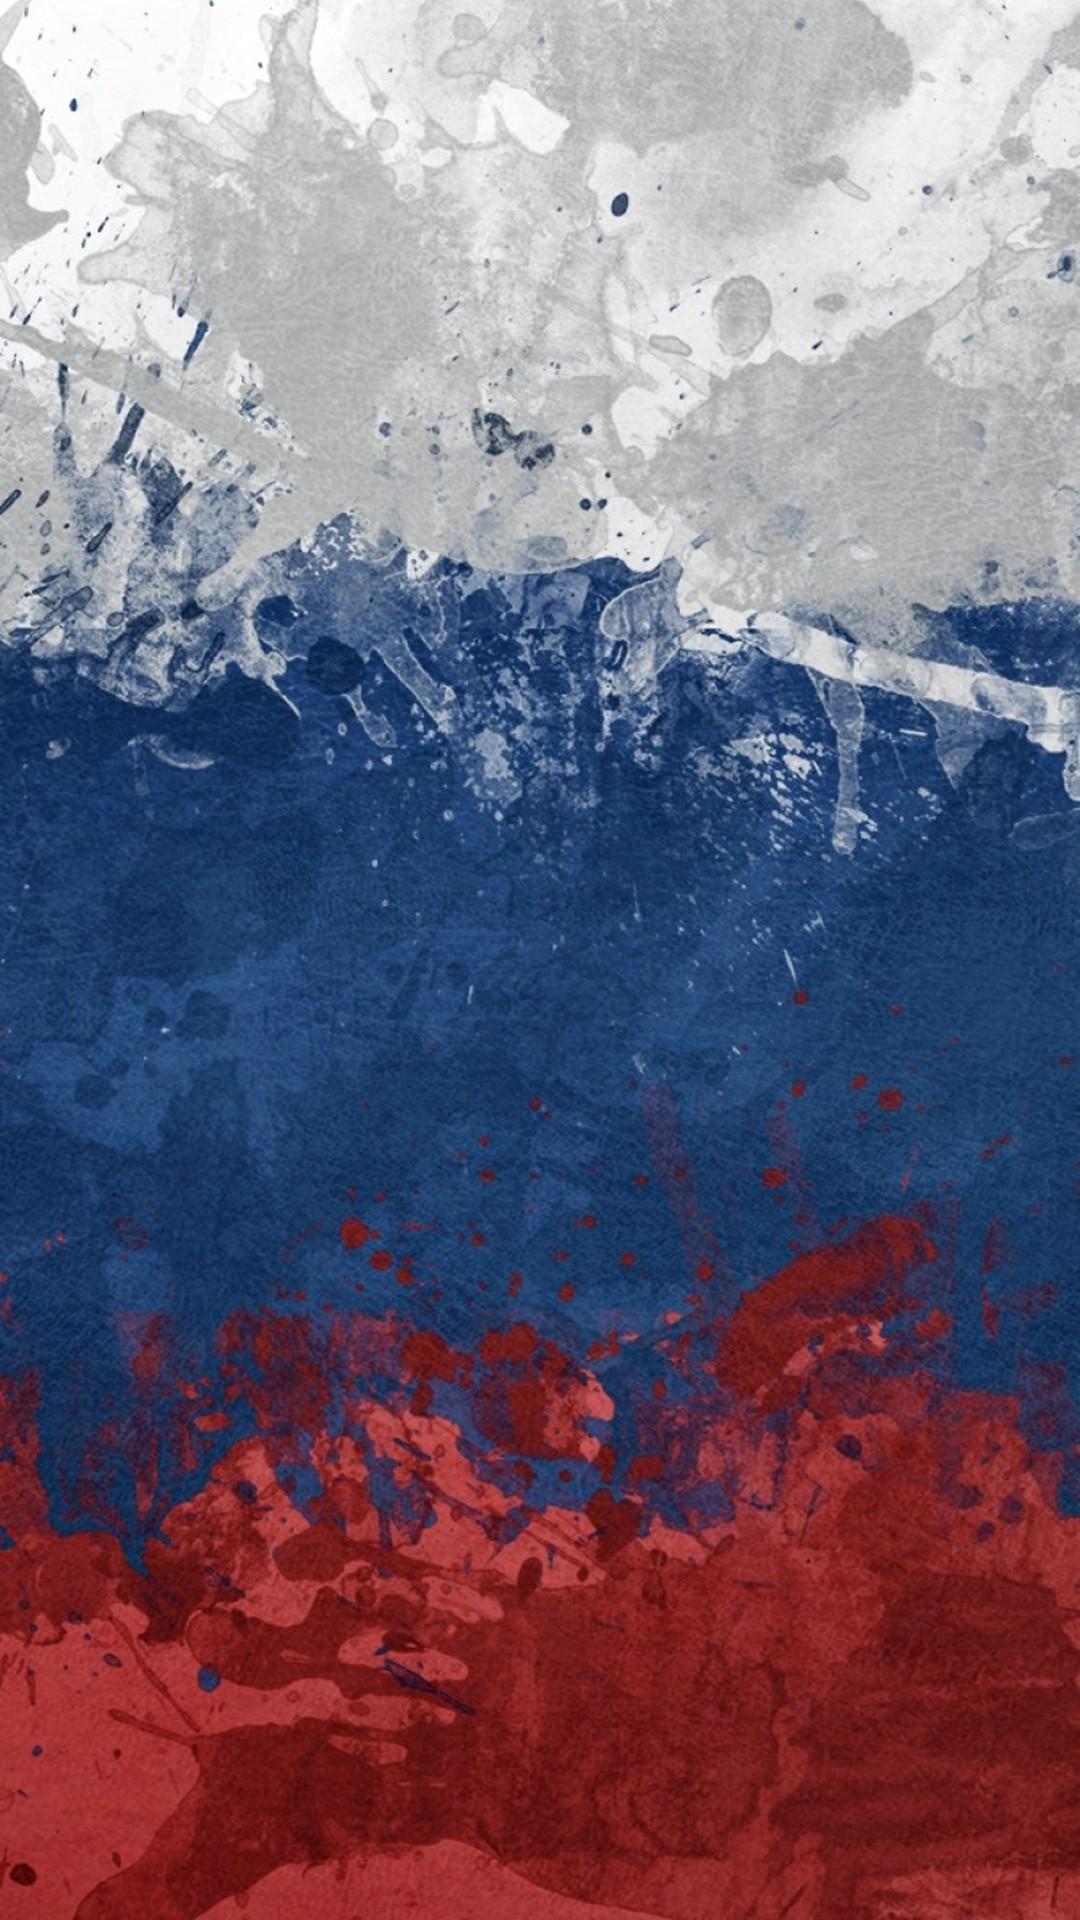 Colors Grunge Paint Art iPhone 6 wallpaper